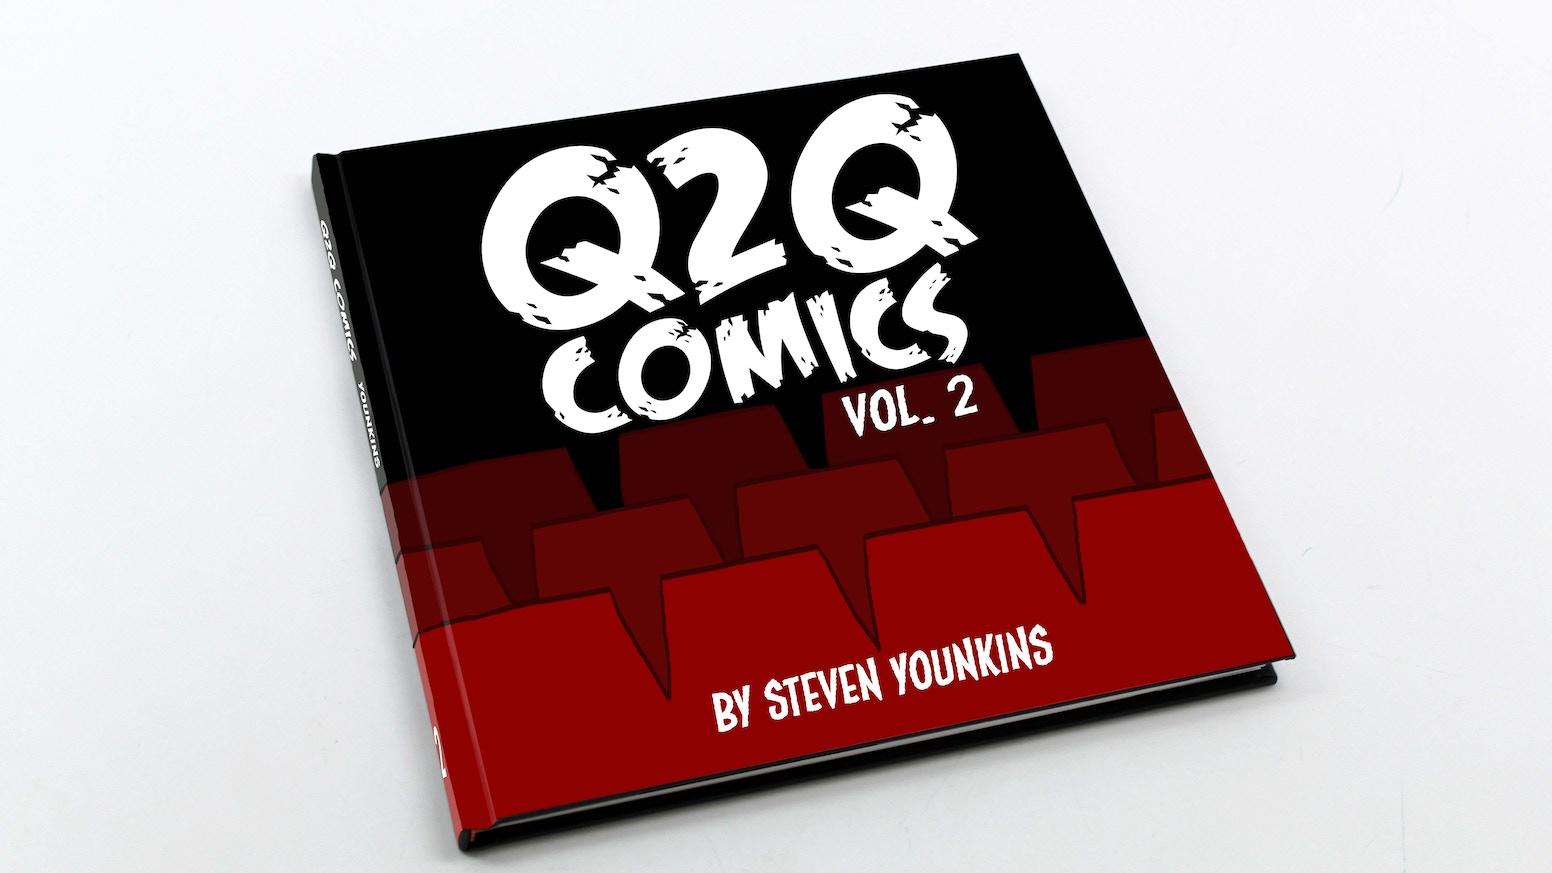 q2q comics volume 2 by steven younkins kickstarter